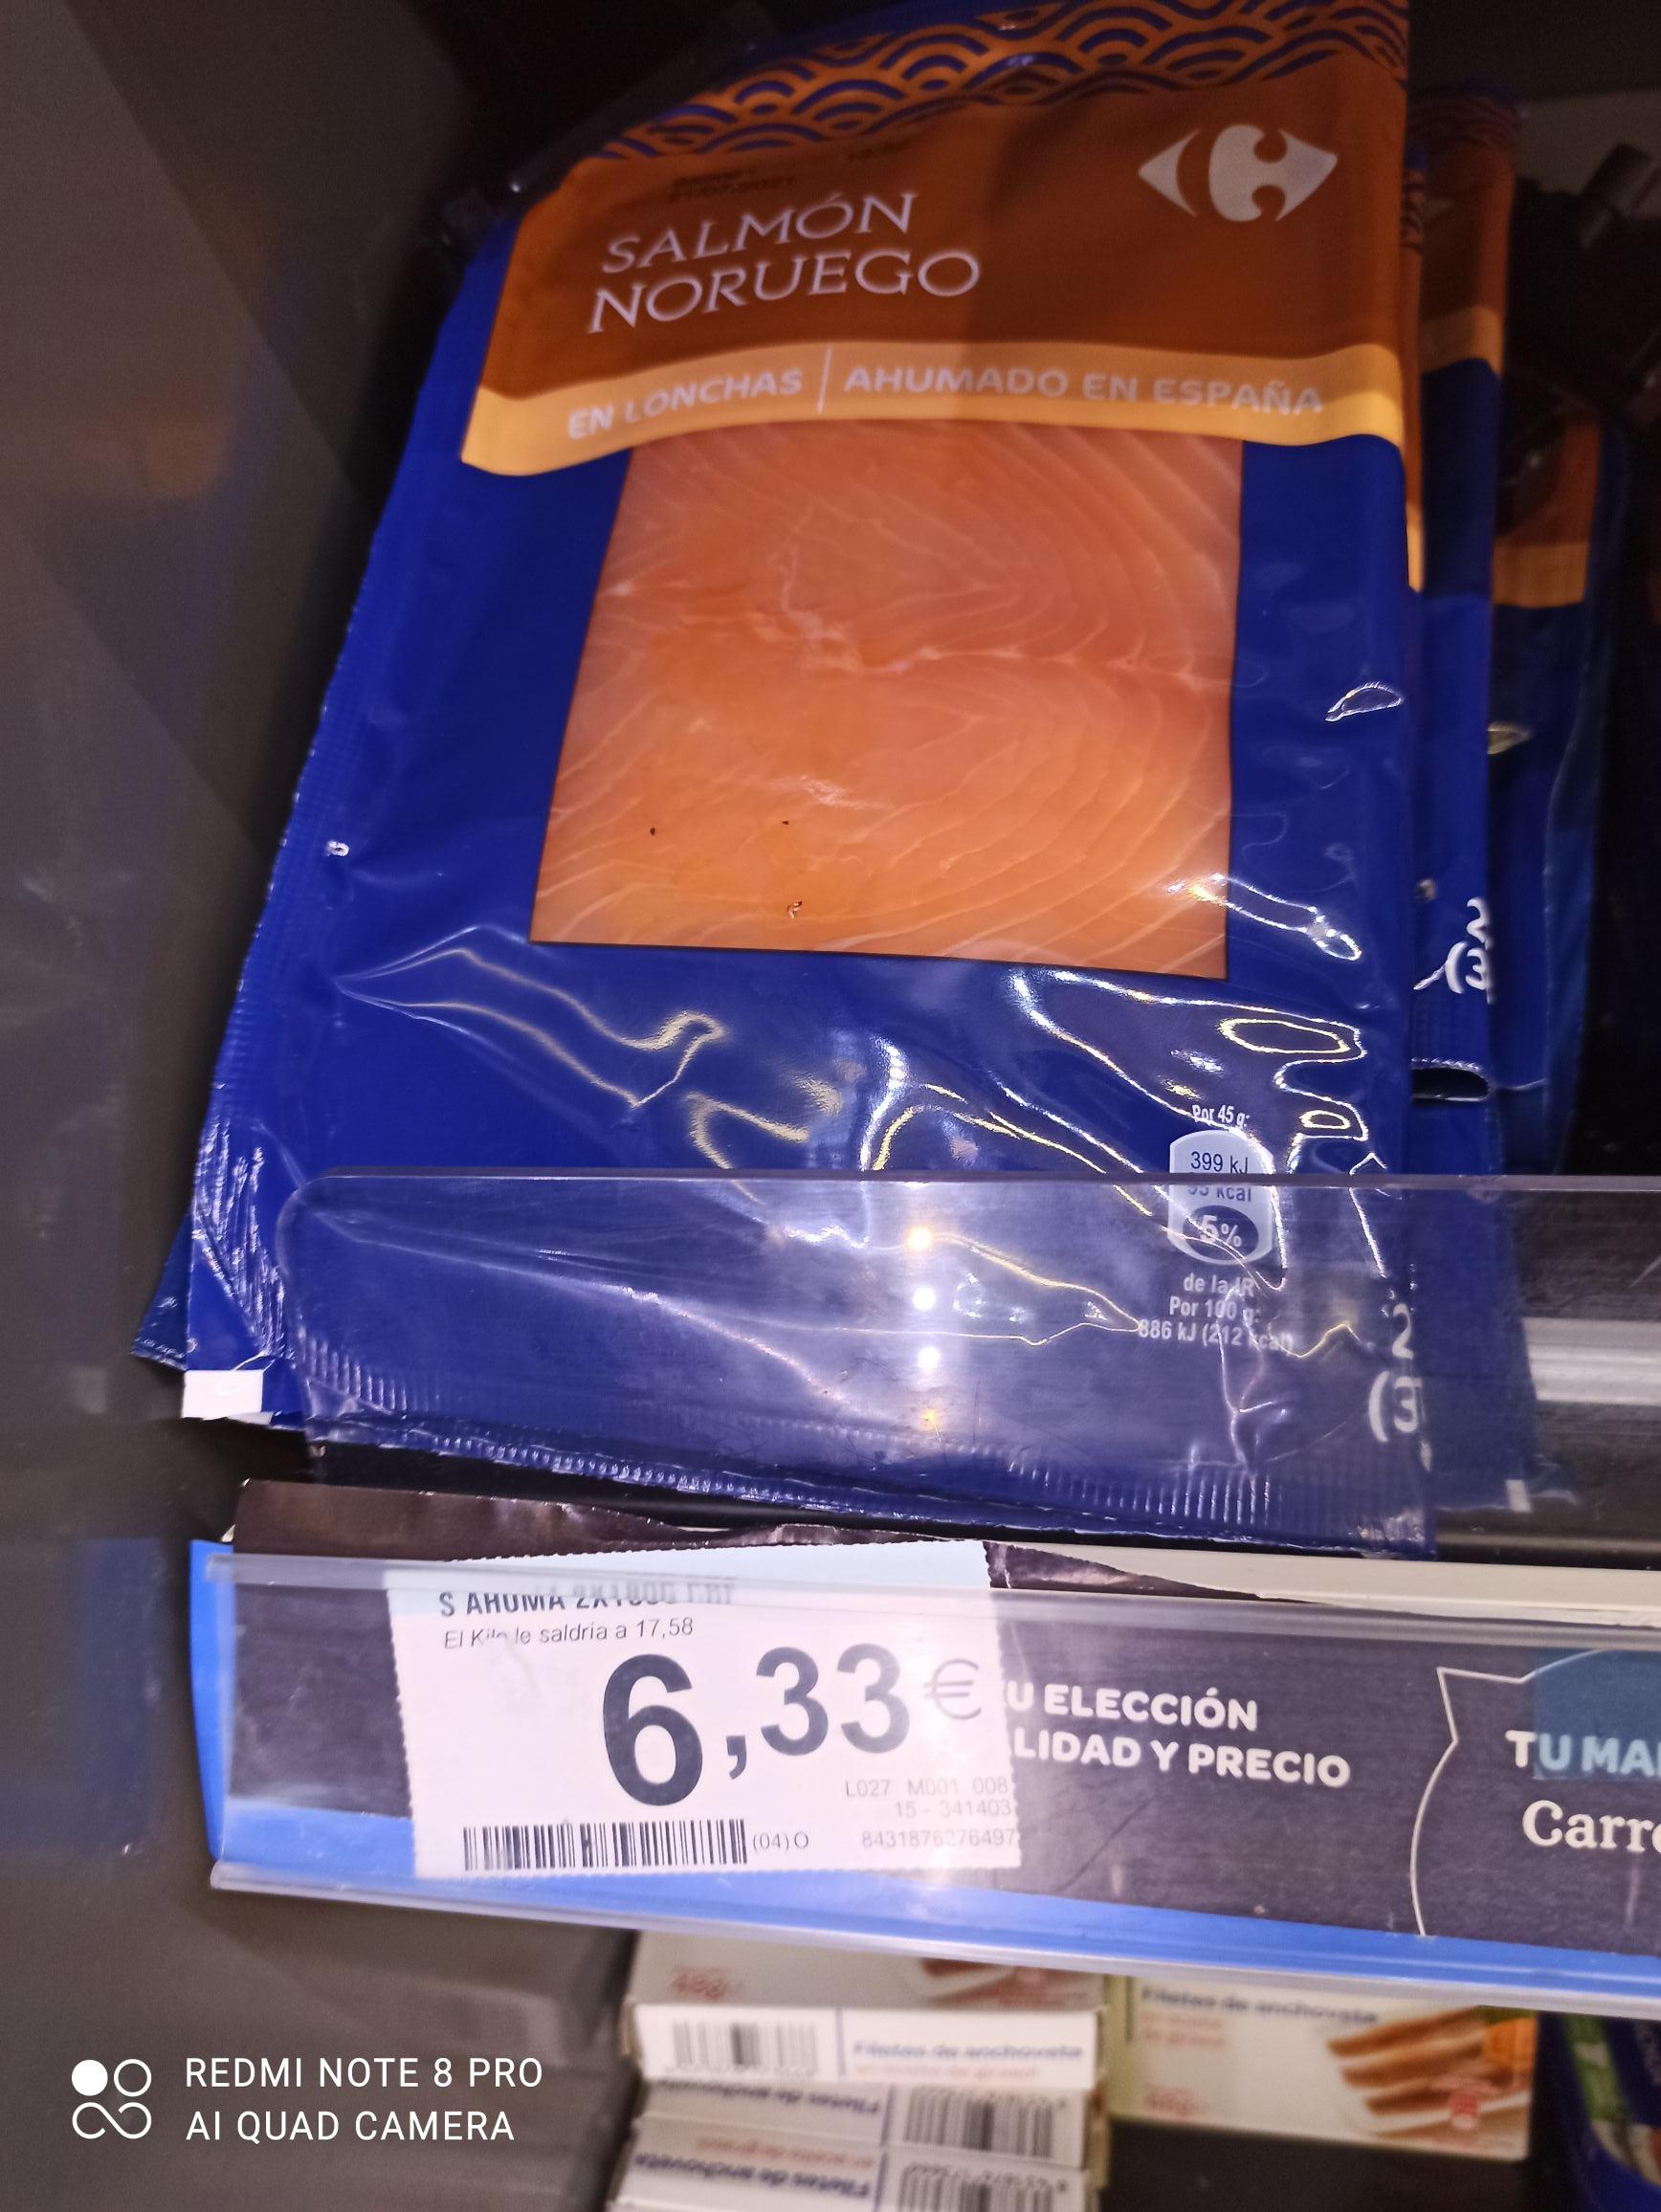 Salmón ahumado 2x180 gramos Carrefour Market Coslada